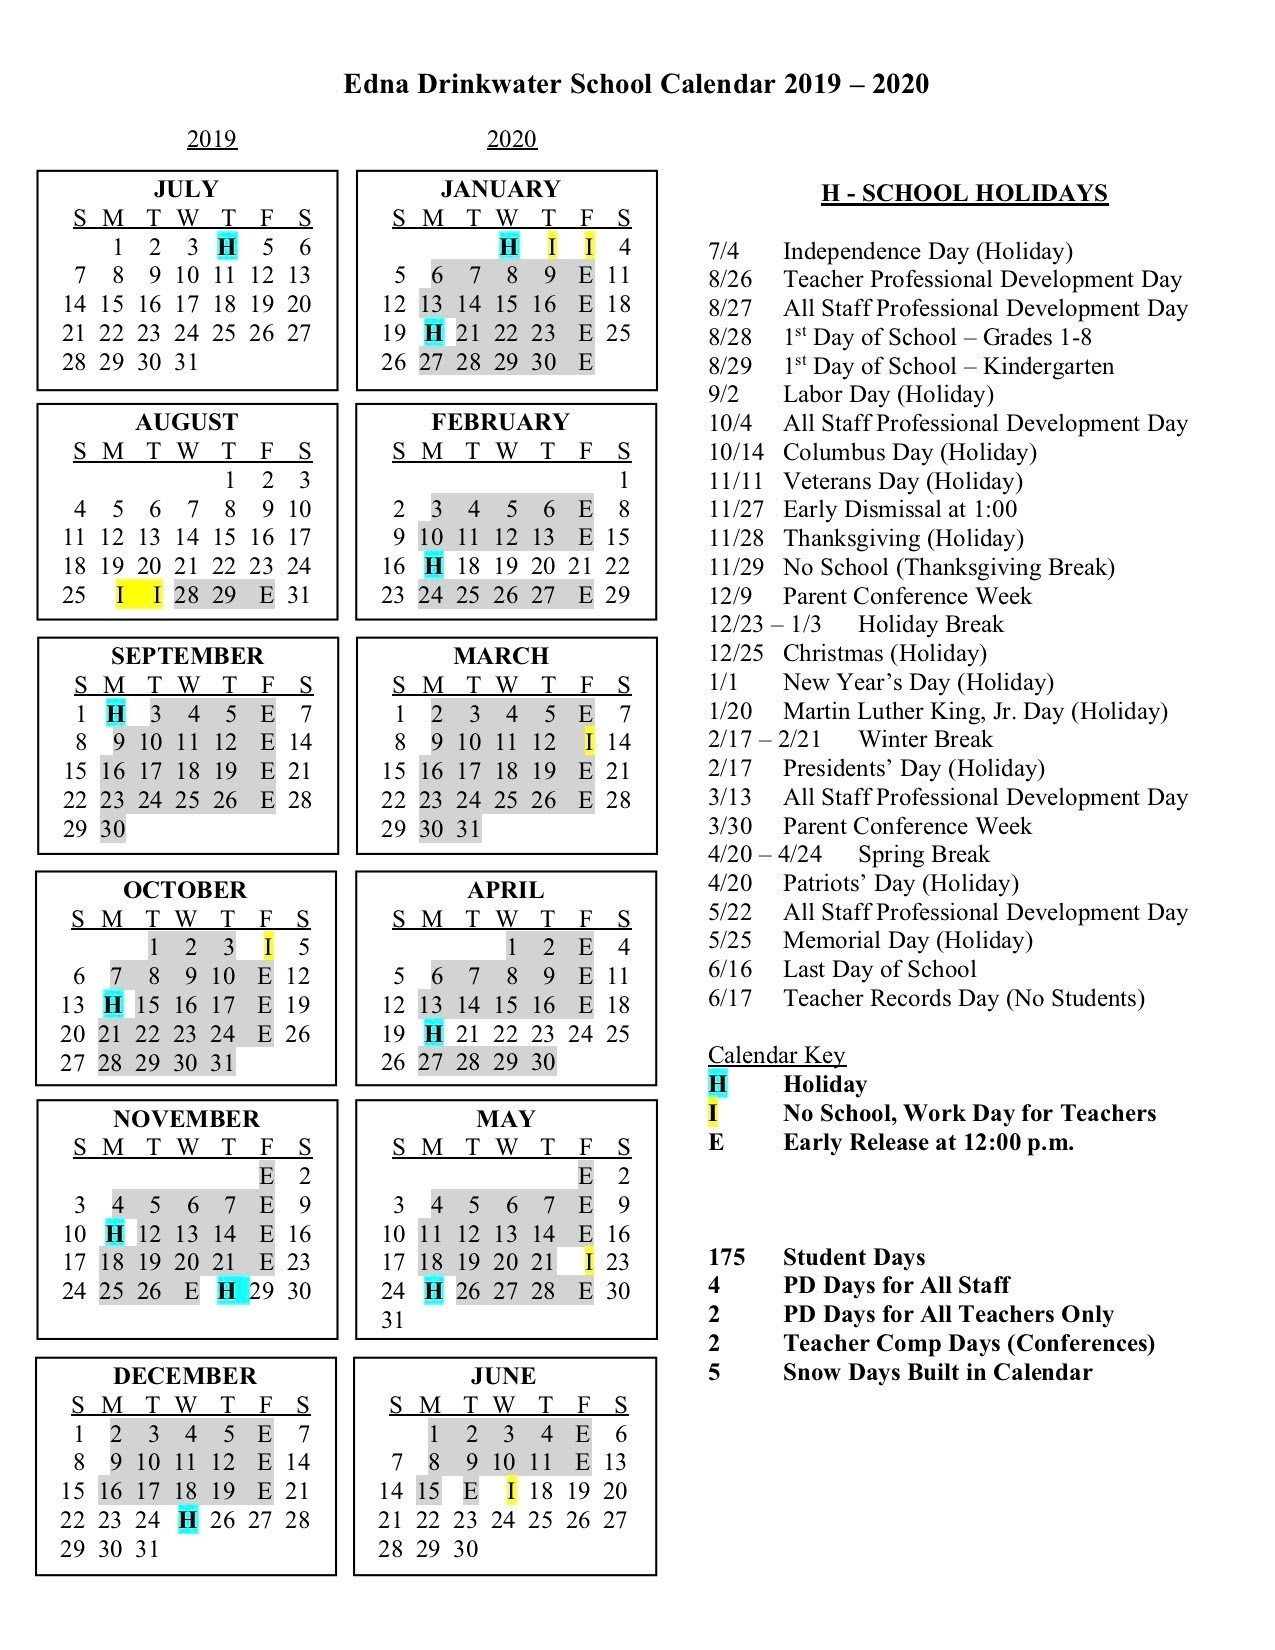 Calendars - Edna Drinkwater School_Rsu 5 School Calendar